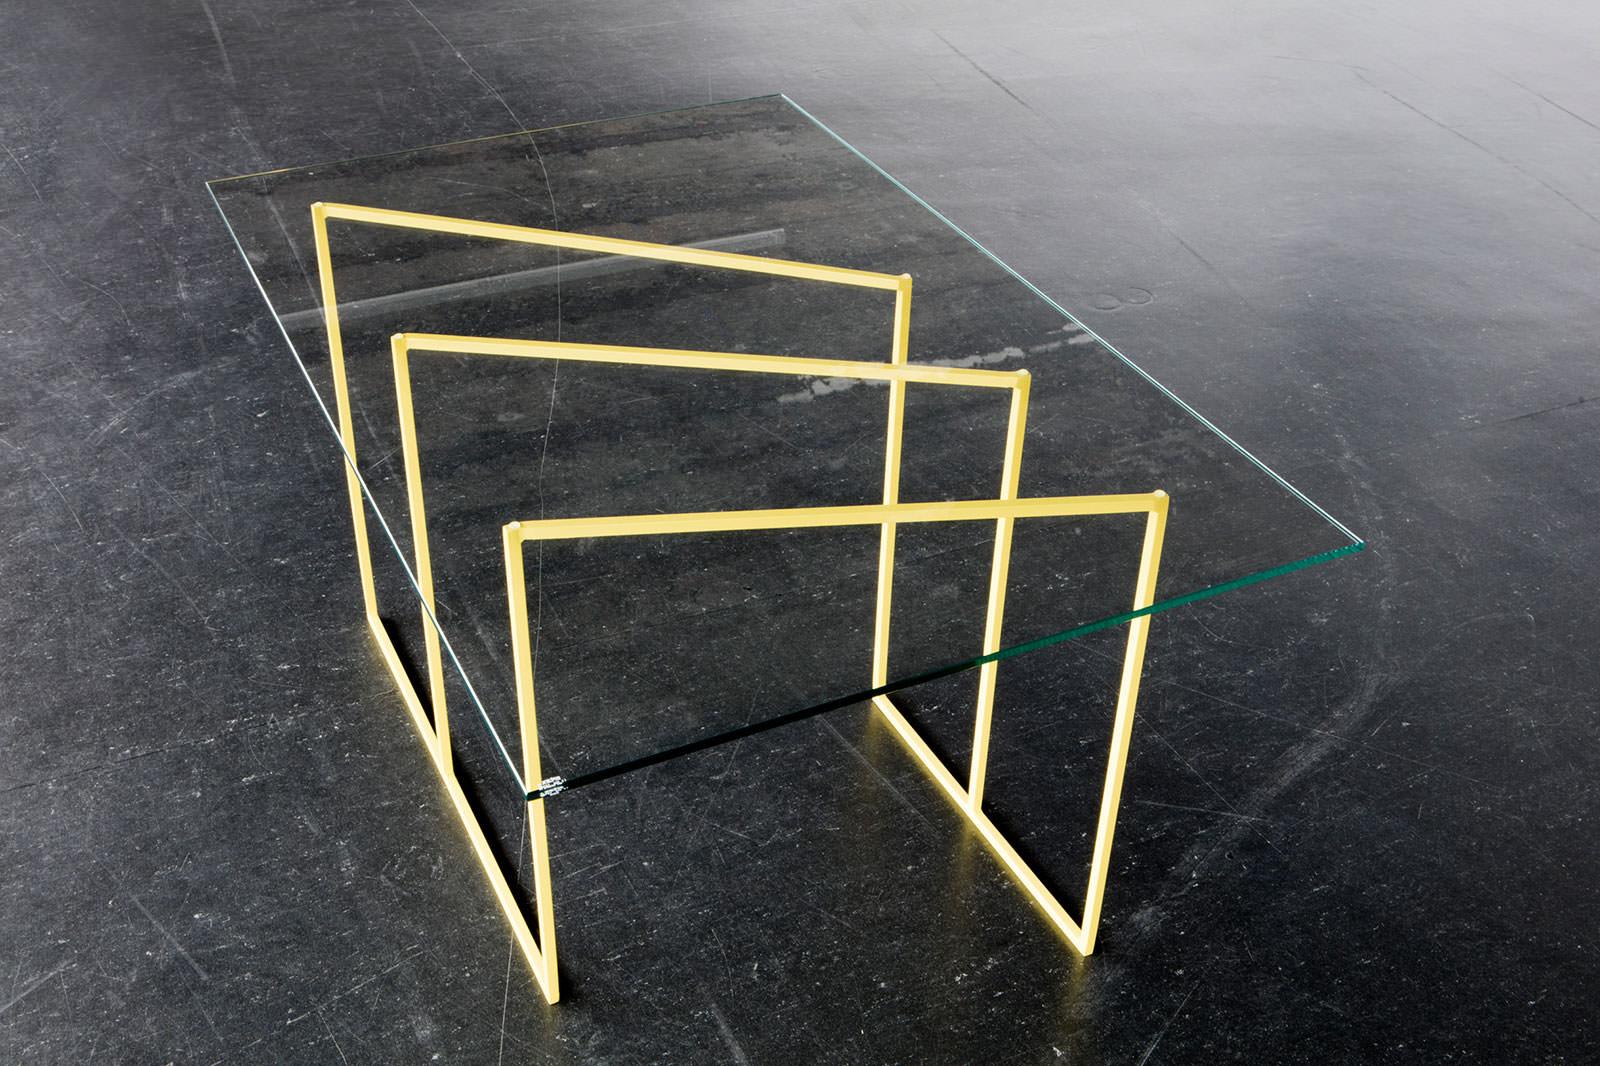 Liddy Scheffknecht, sunbeam (table), 2018, Stahl lackiert, Glas, 100 x 65 x 54 cm <br>© Liddy Scheffknecht &amp; Bildrecht Wien